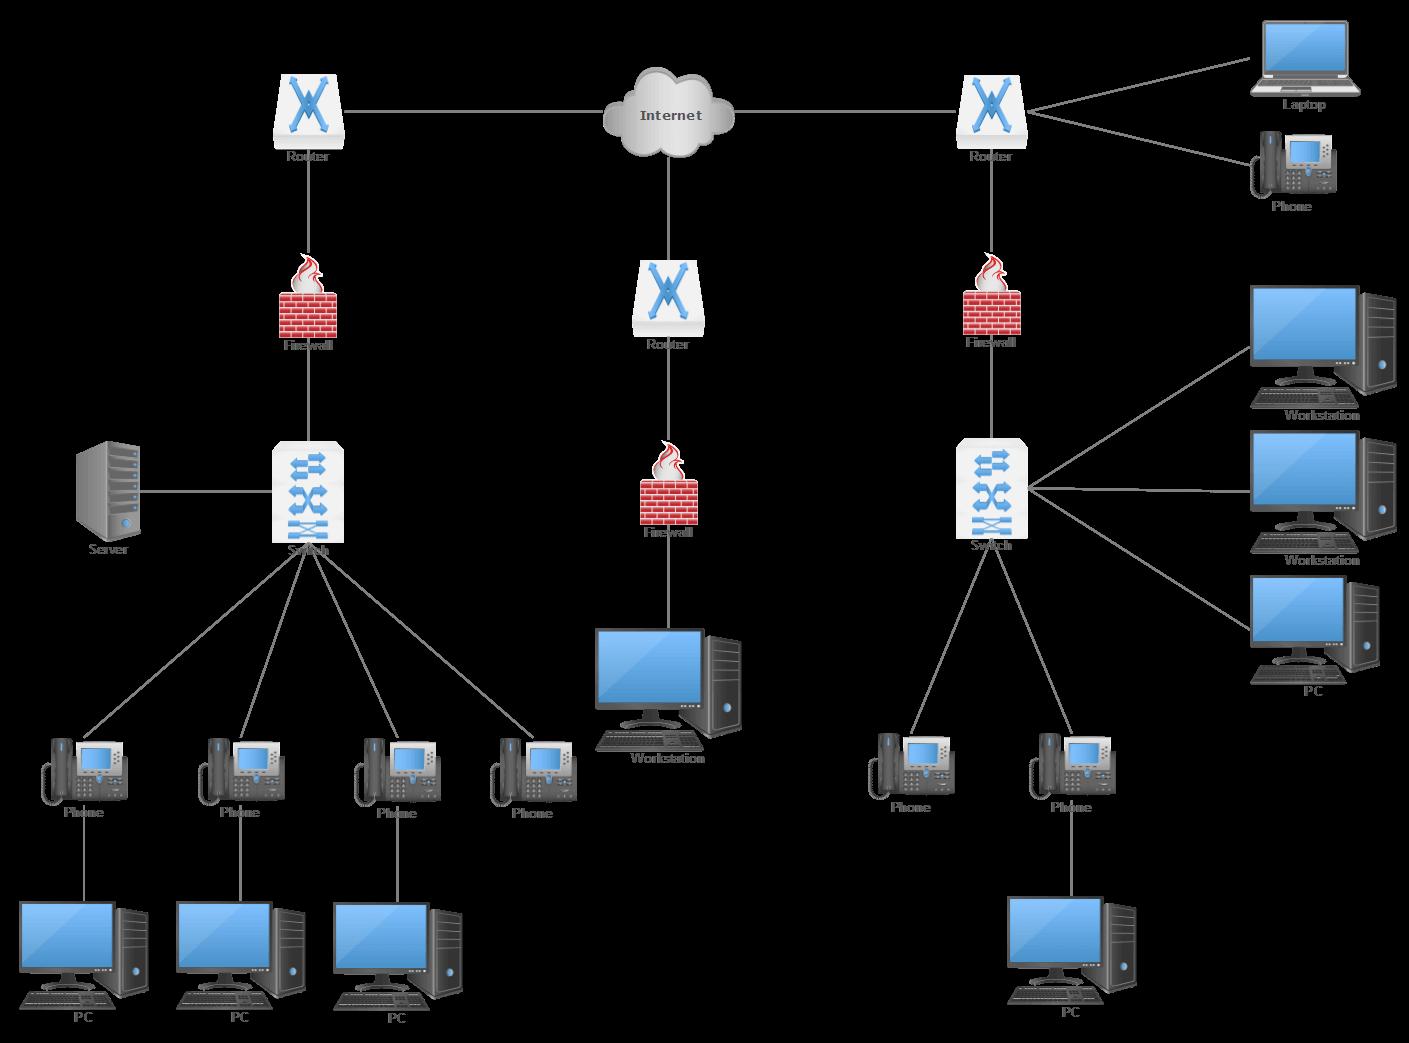 network diagram software free download or network diagram Diagram Of Drawing smartdraw create flowcharts, floor